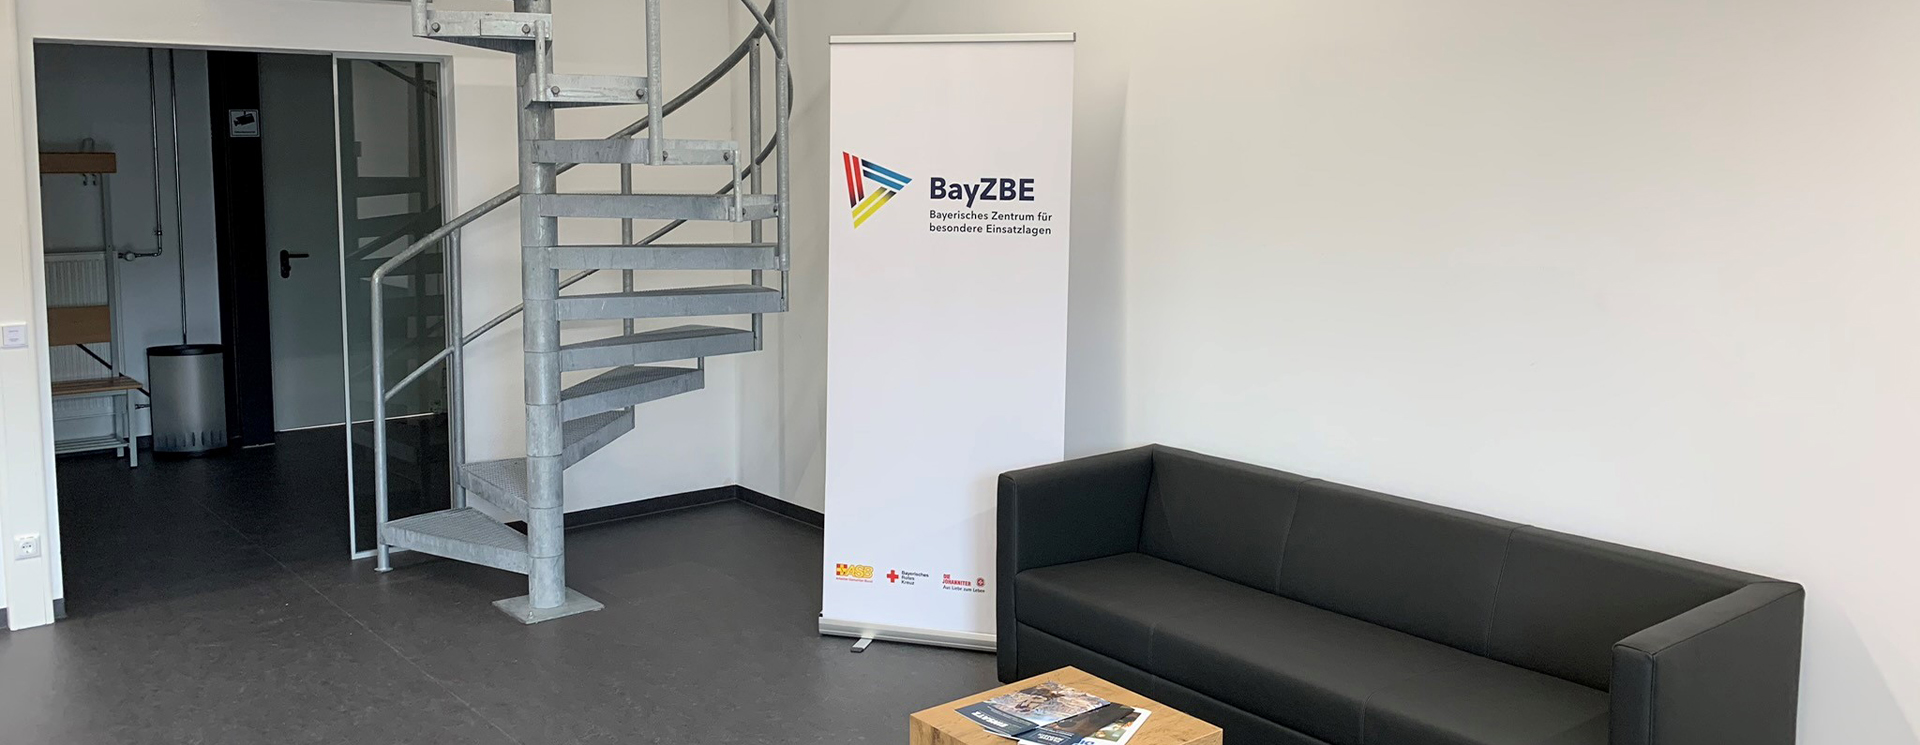 Bayzbe